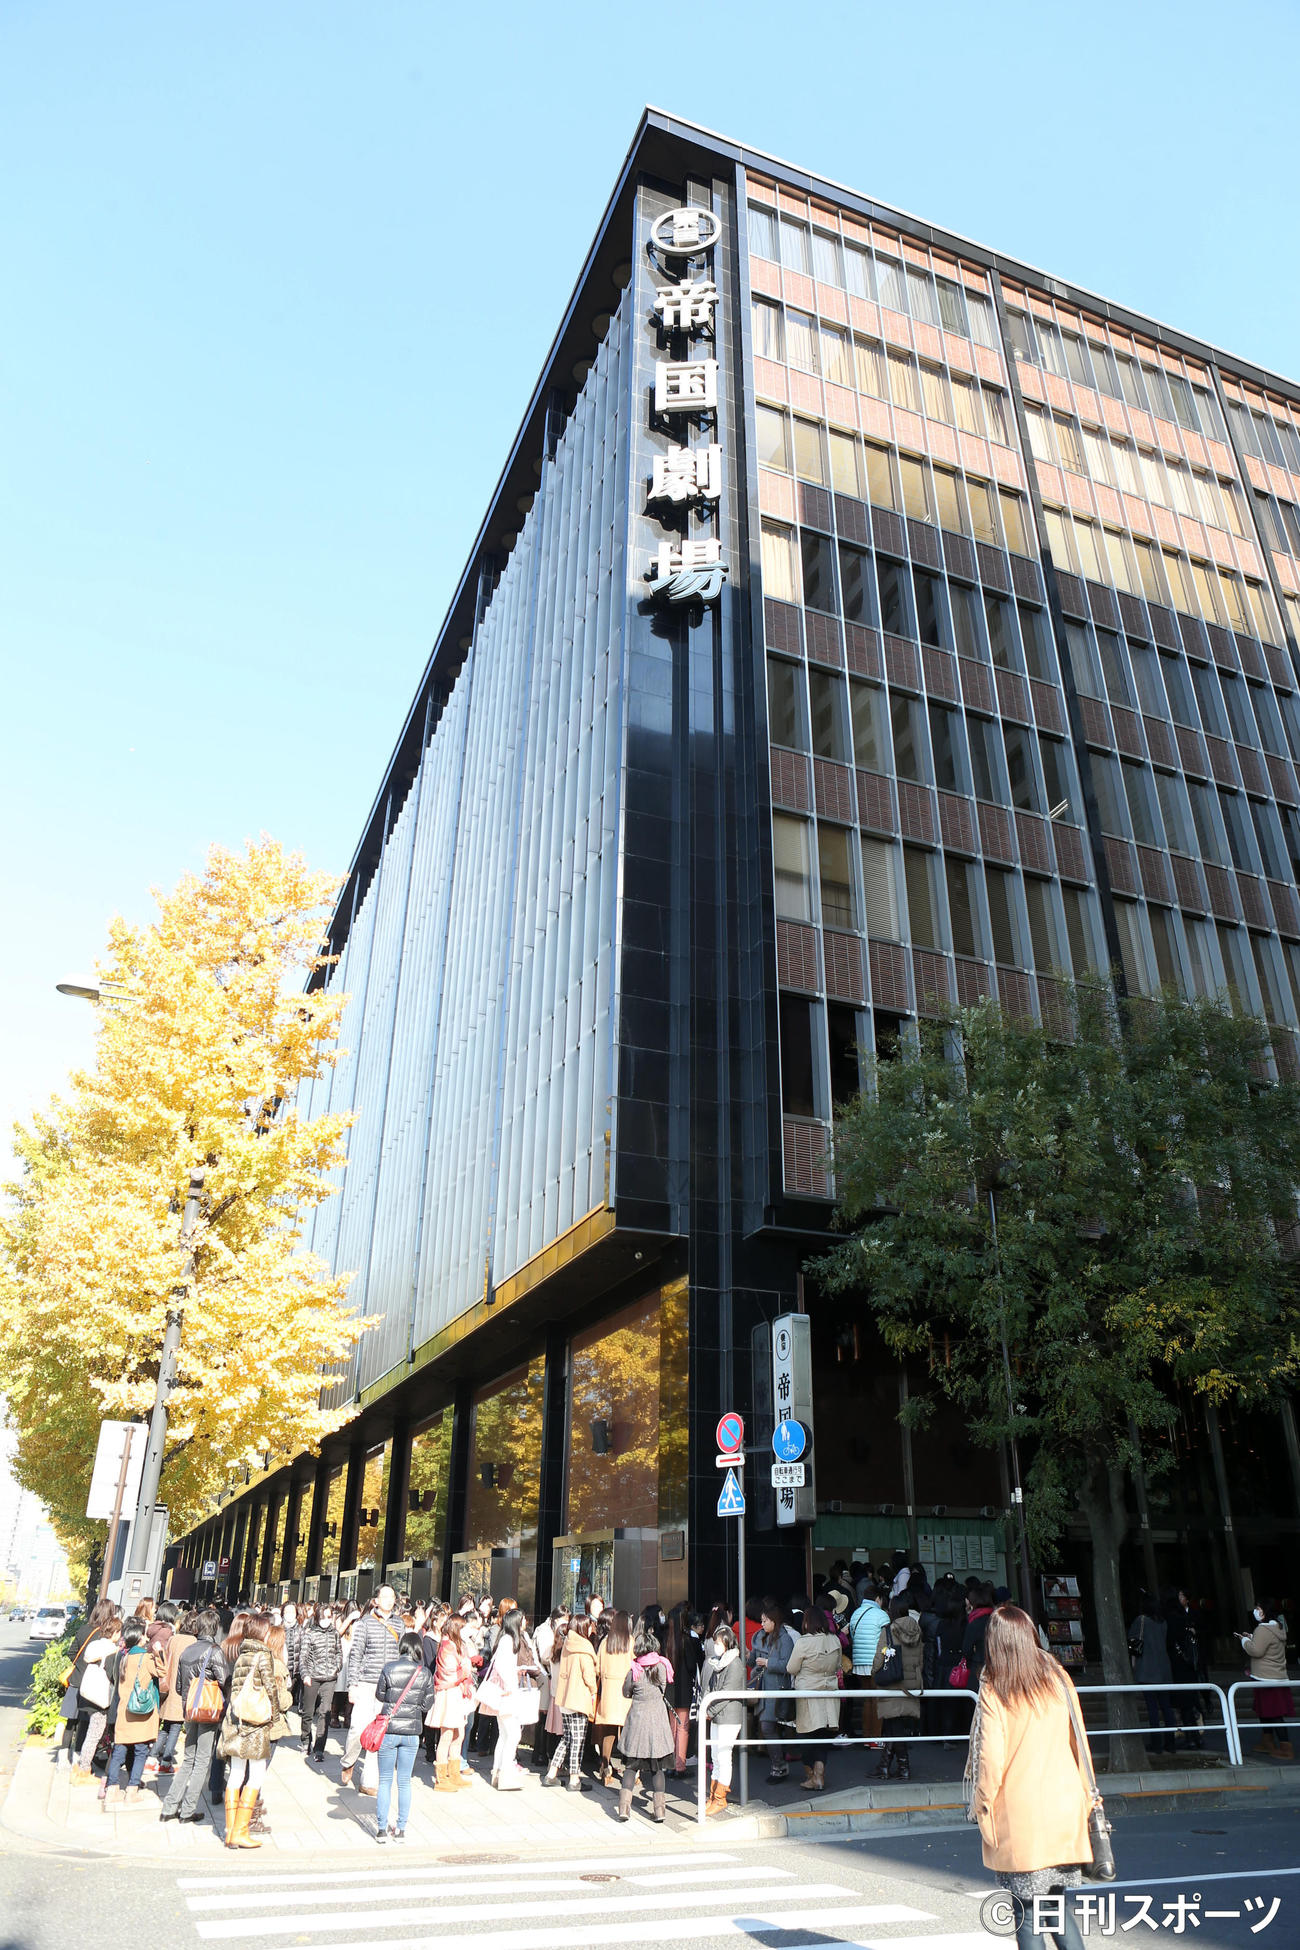 帝国劇場の外観(2014年12月8日撮影)